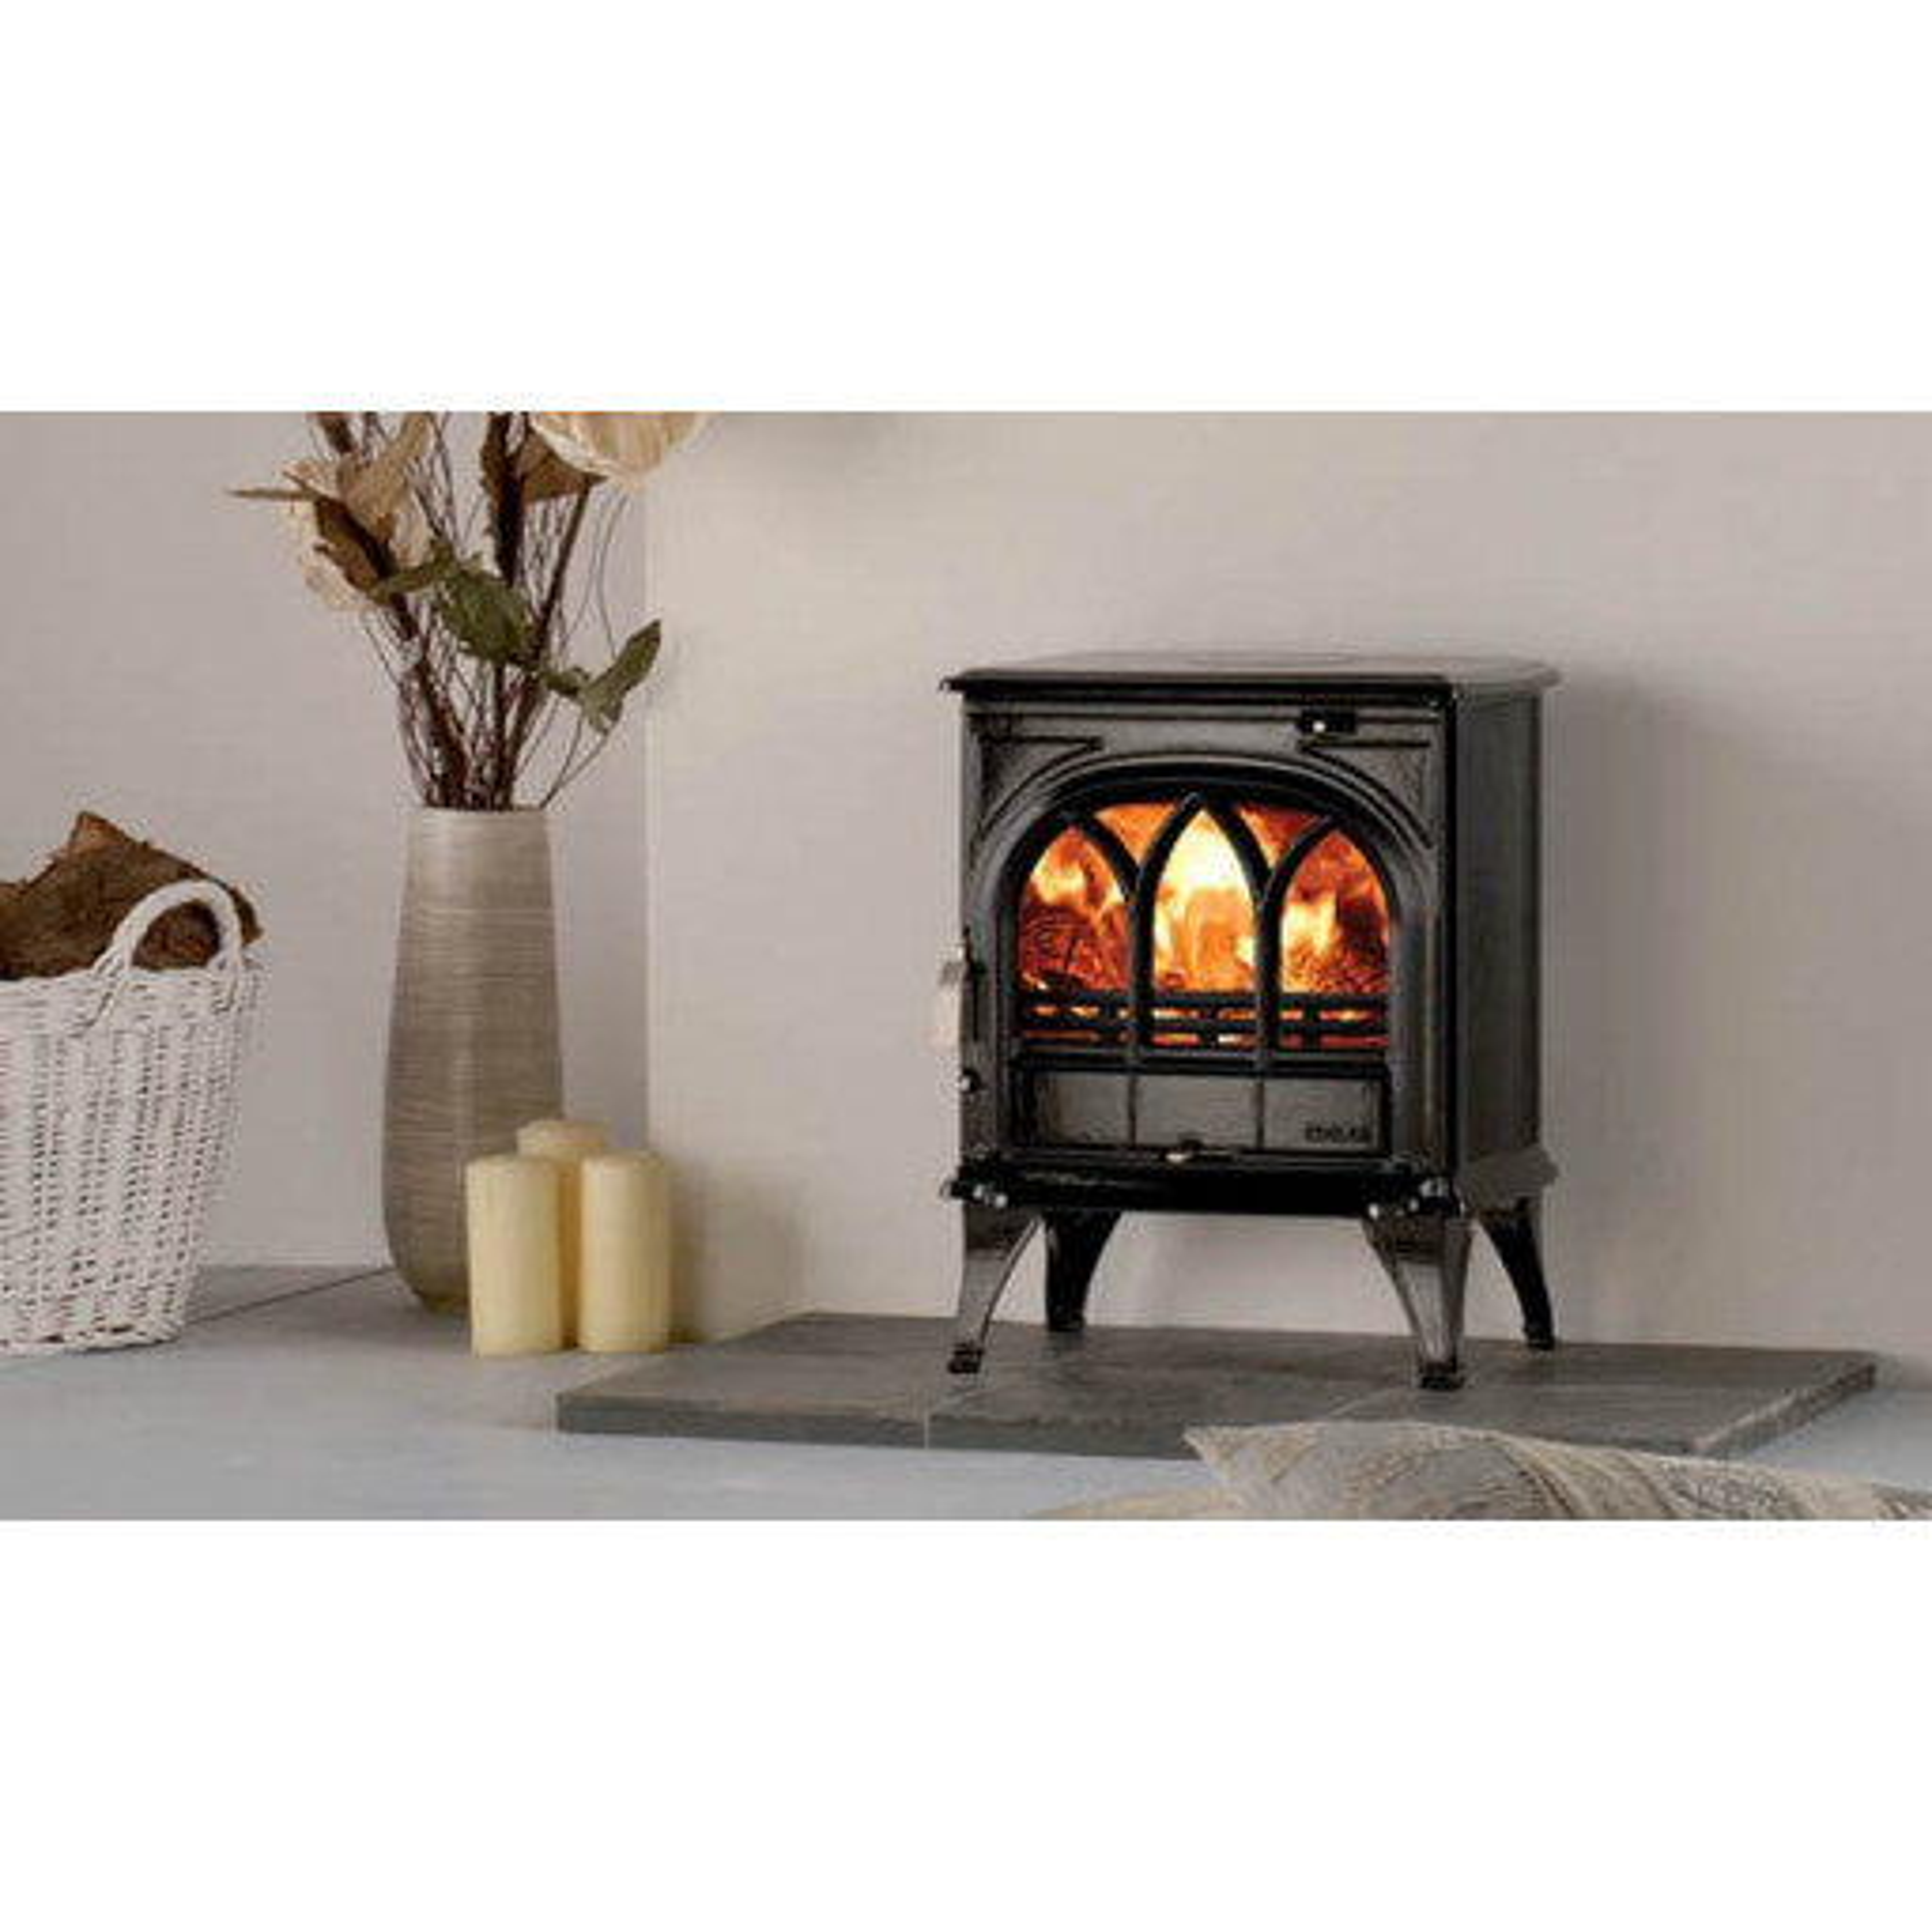 Huntingdon 25 DEFRA multifuel stove